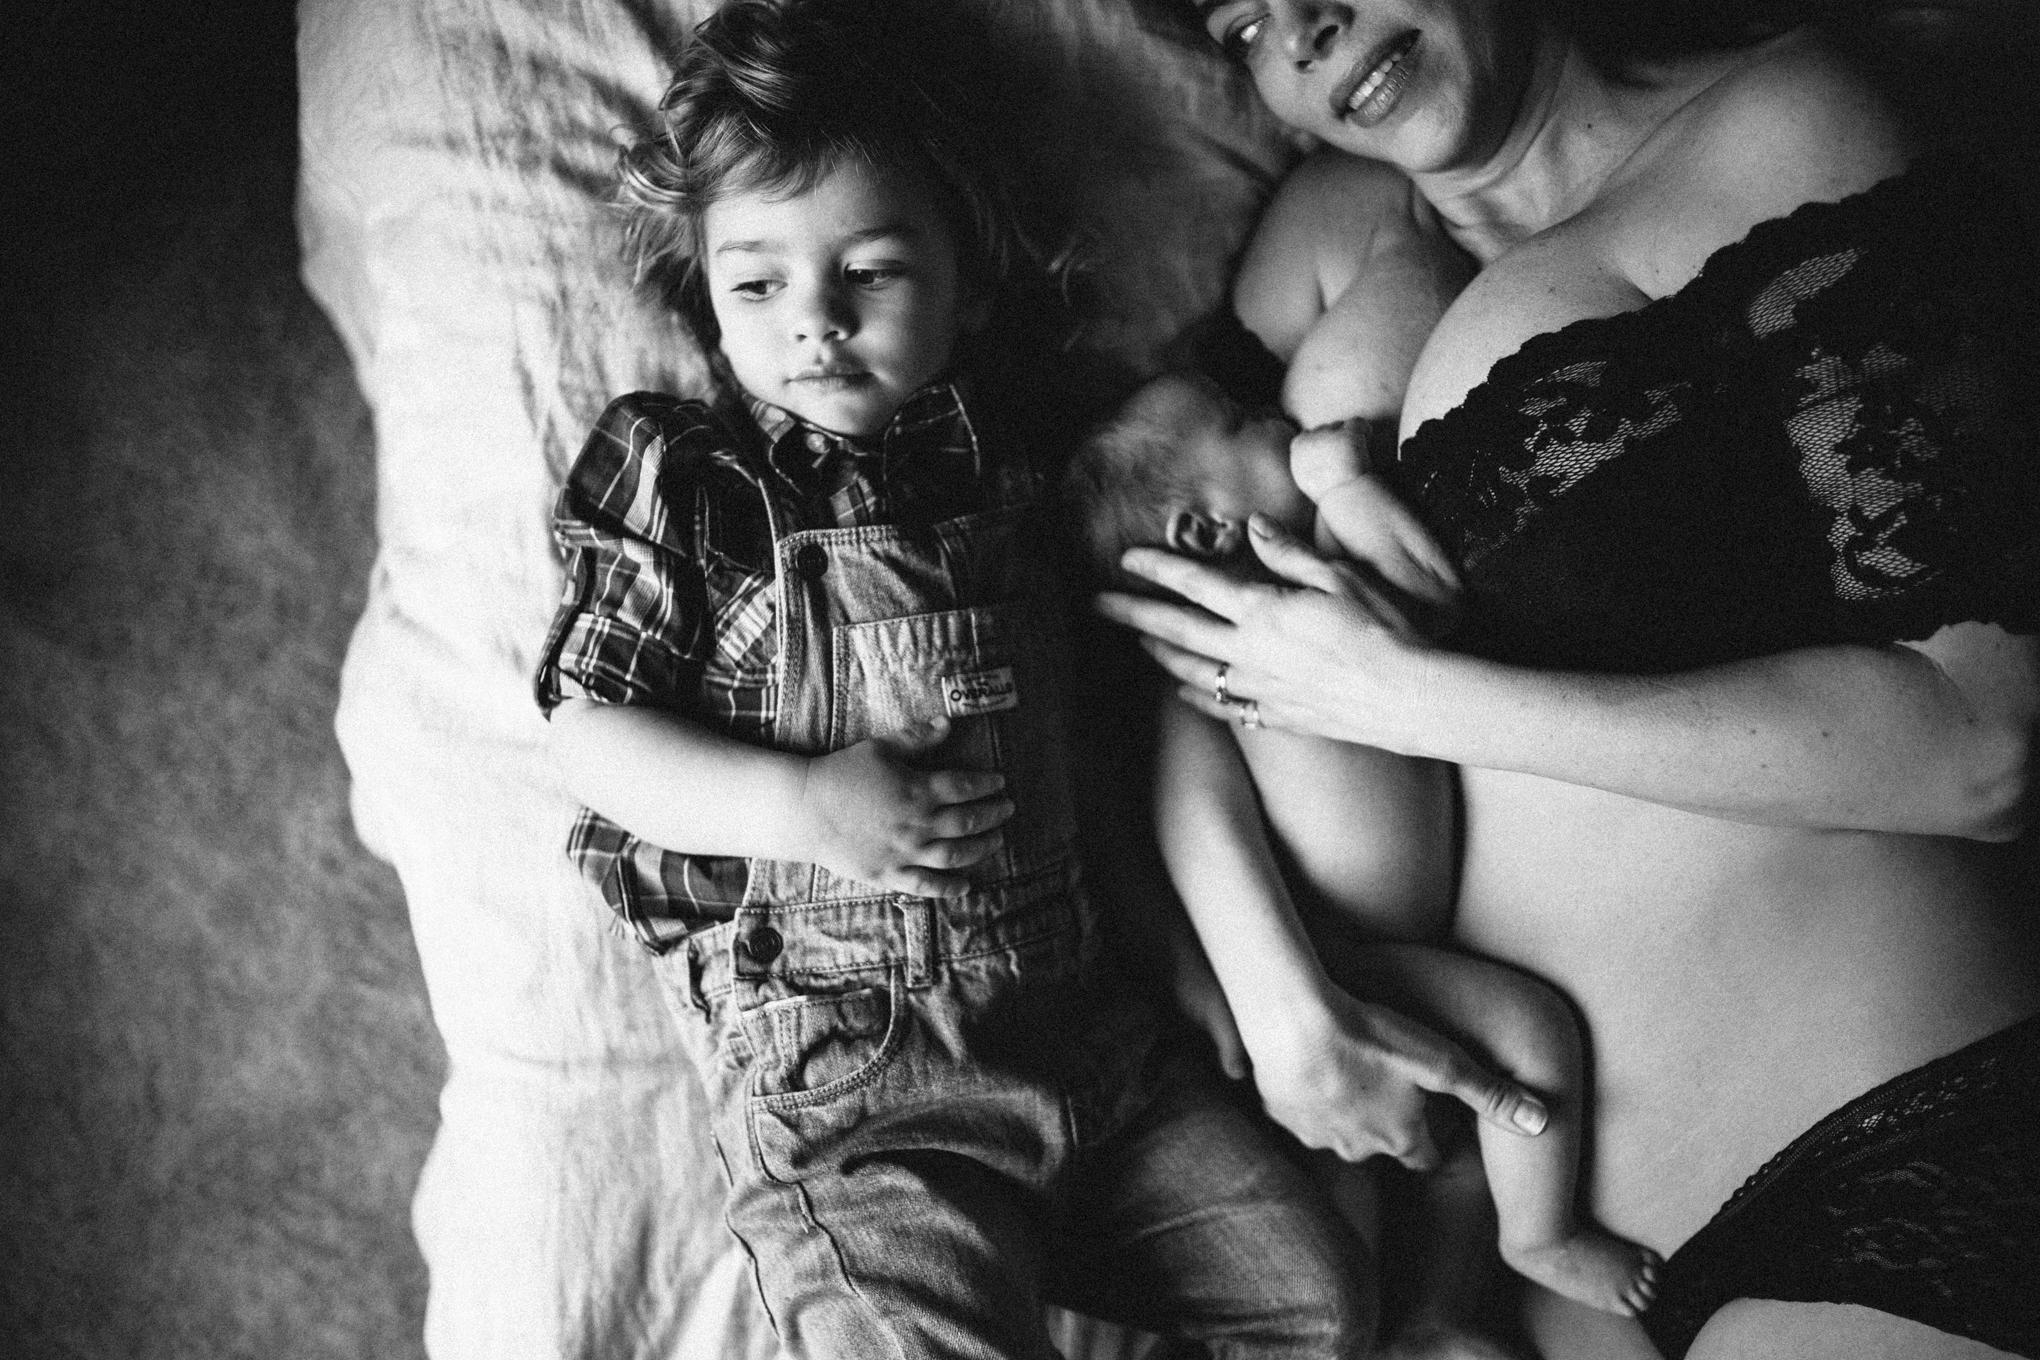 portland-in-home-newborn-boho-session-4.jpg